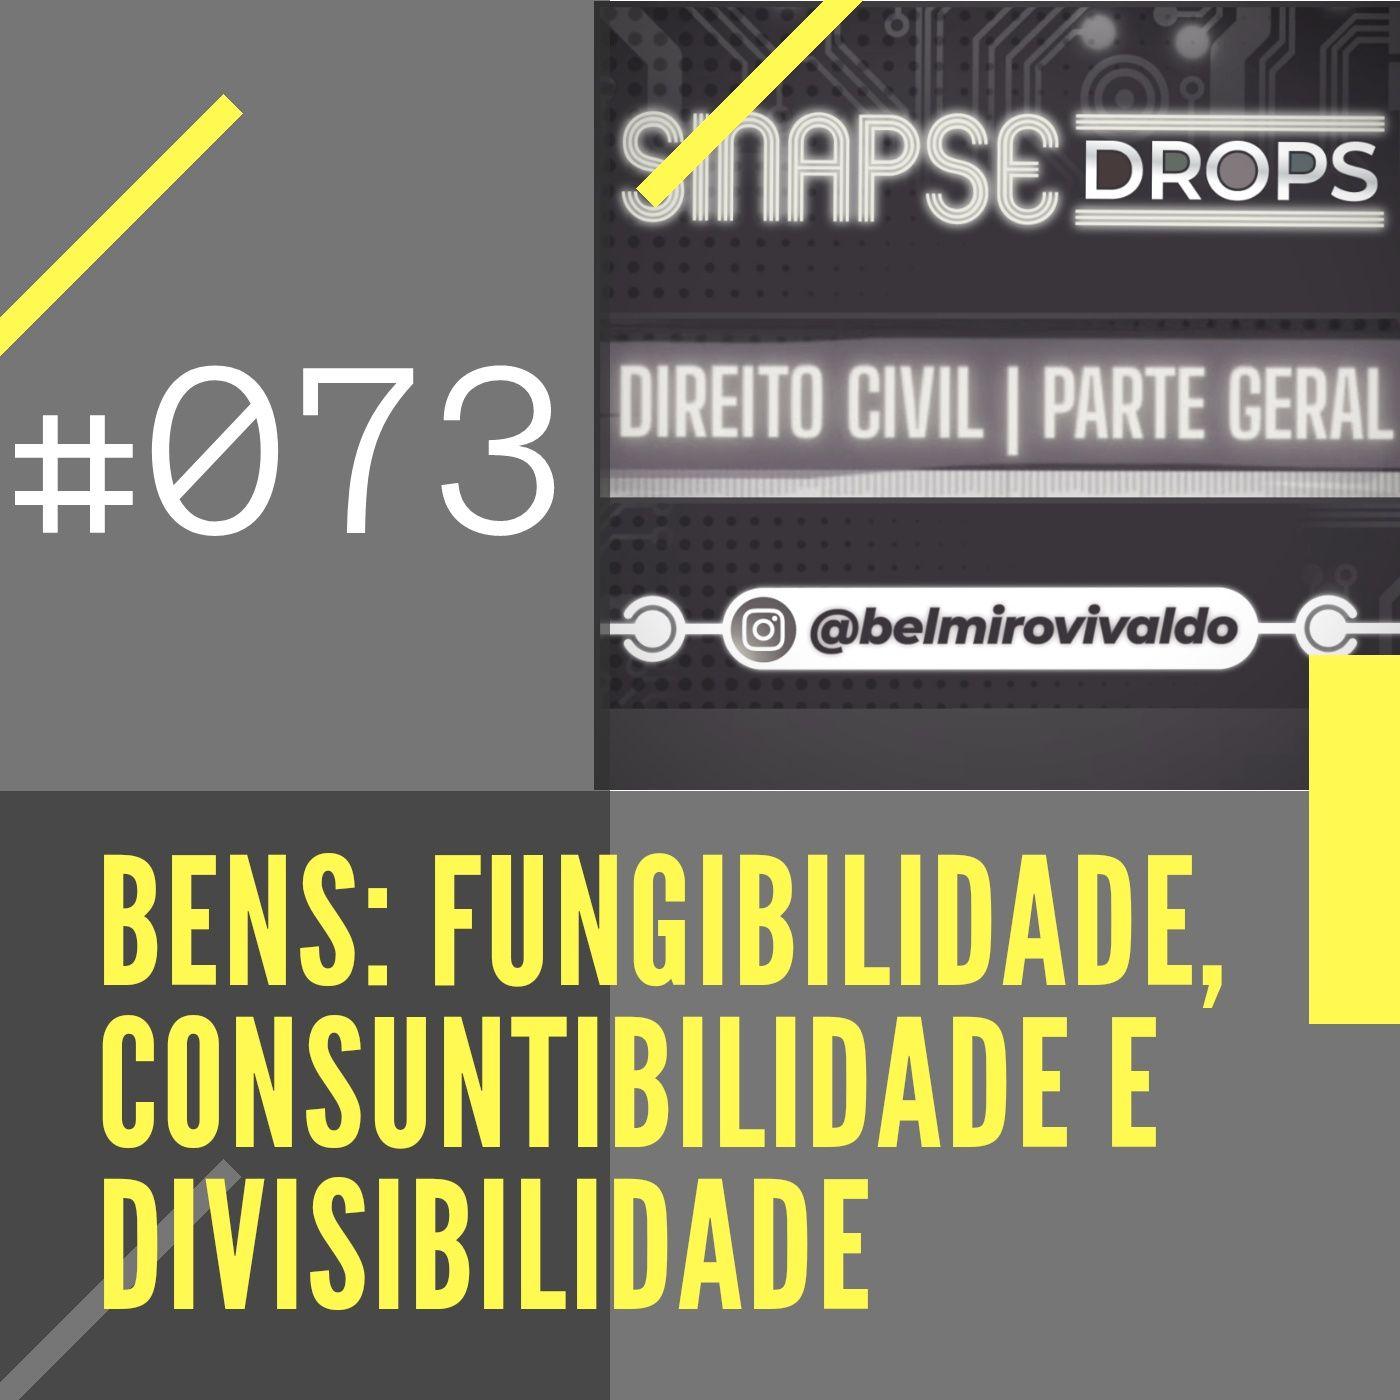 073   Bens - infungibilidade, consuntibilidade e divisibilidade.